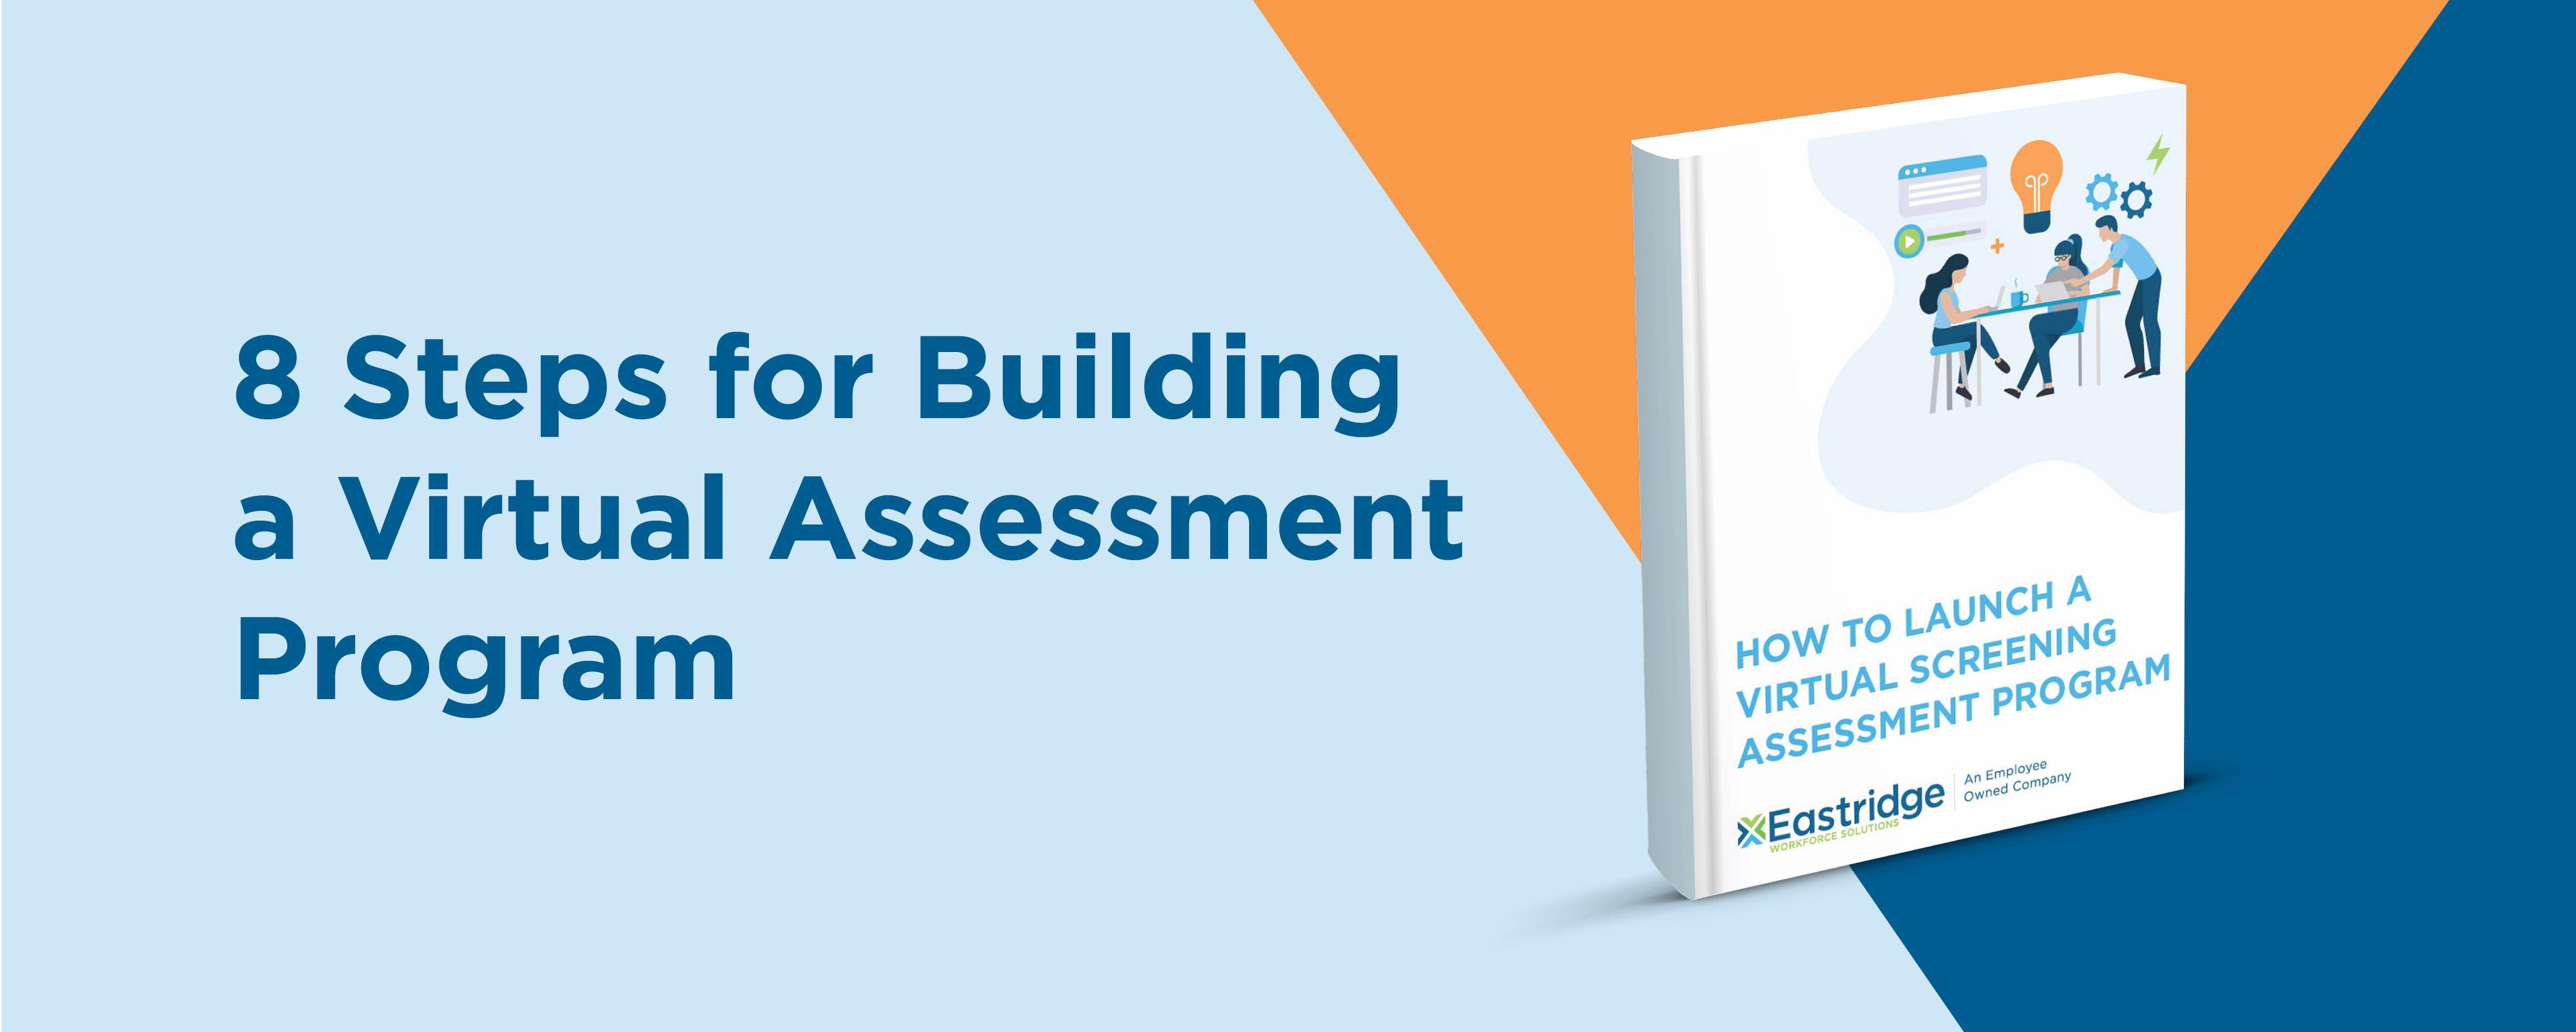 8 Steps for Building a Virtual Assessment Program